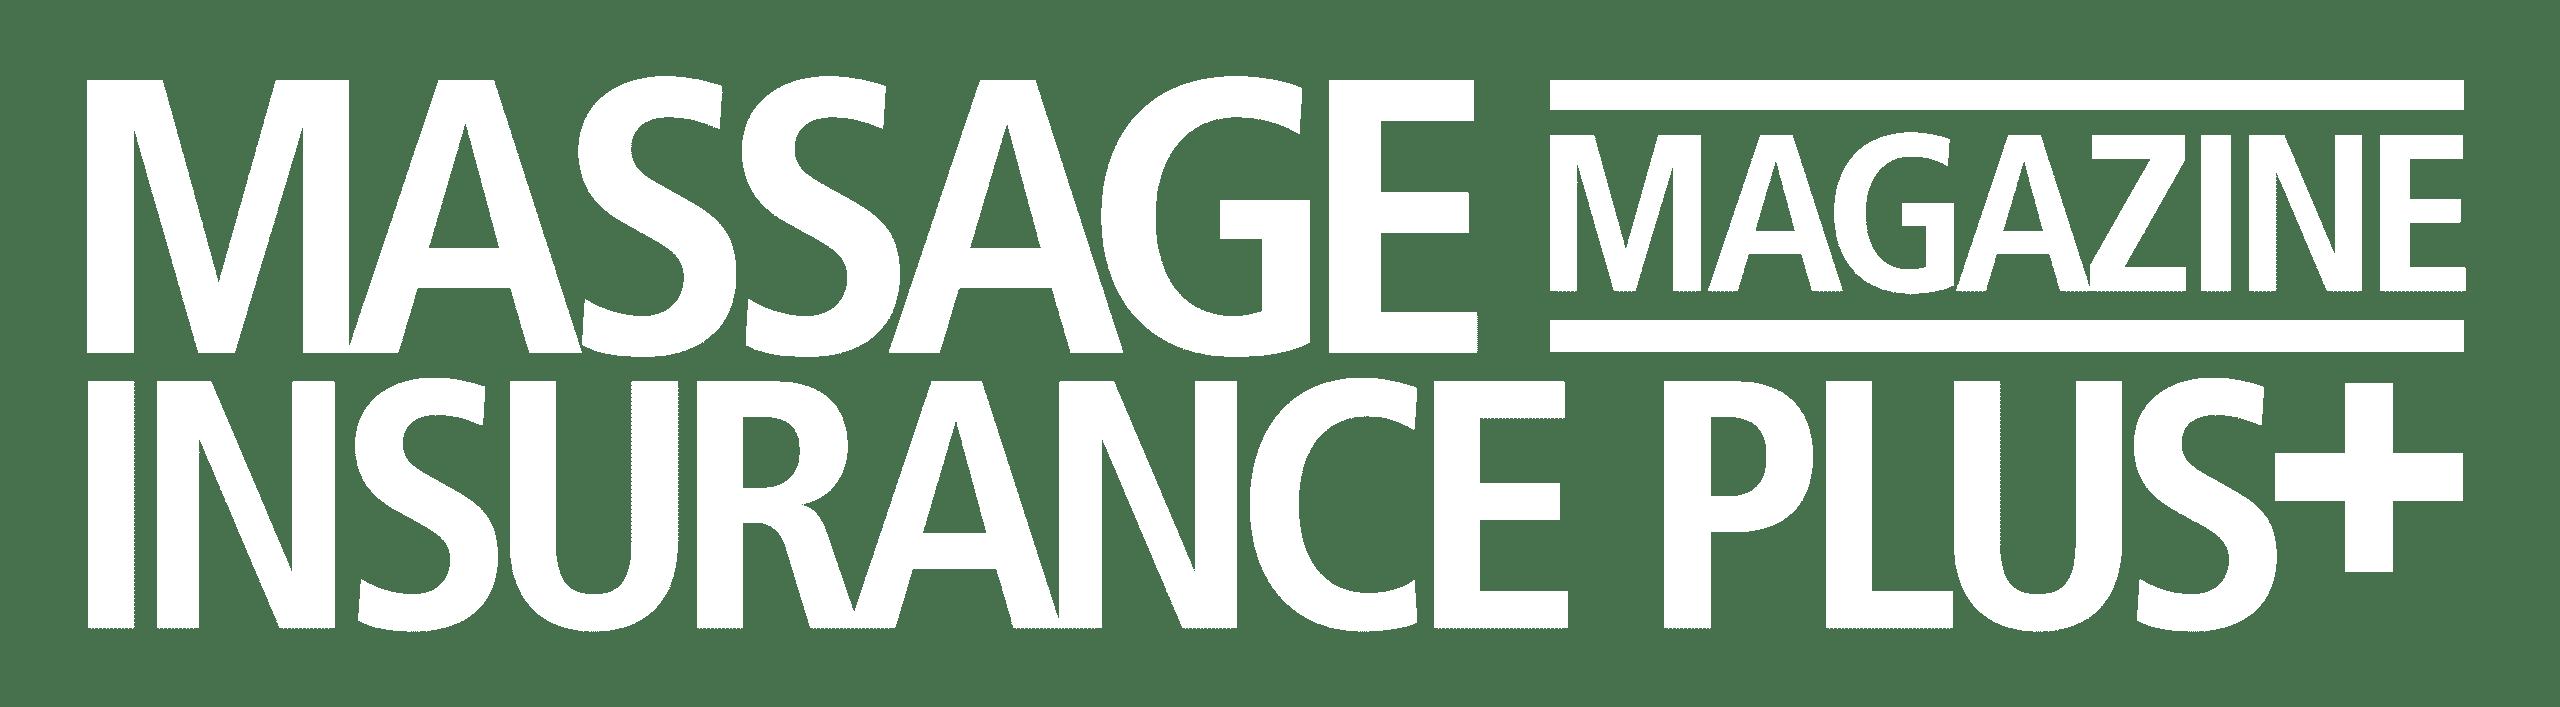 Mage Insurance Plus